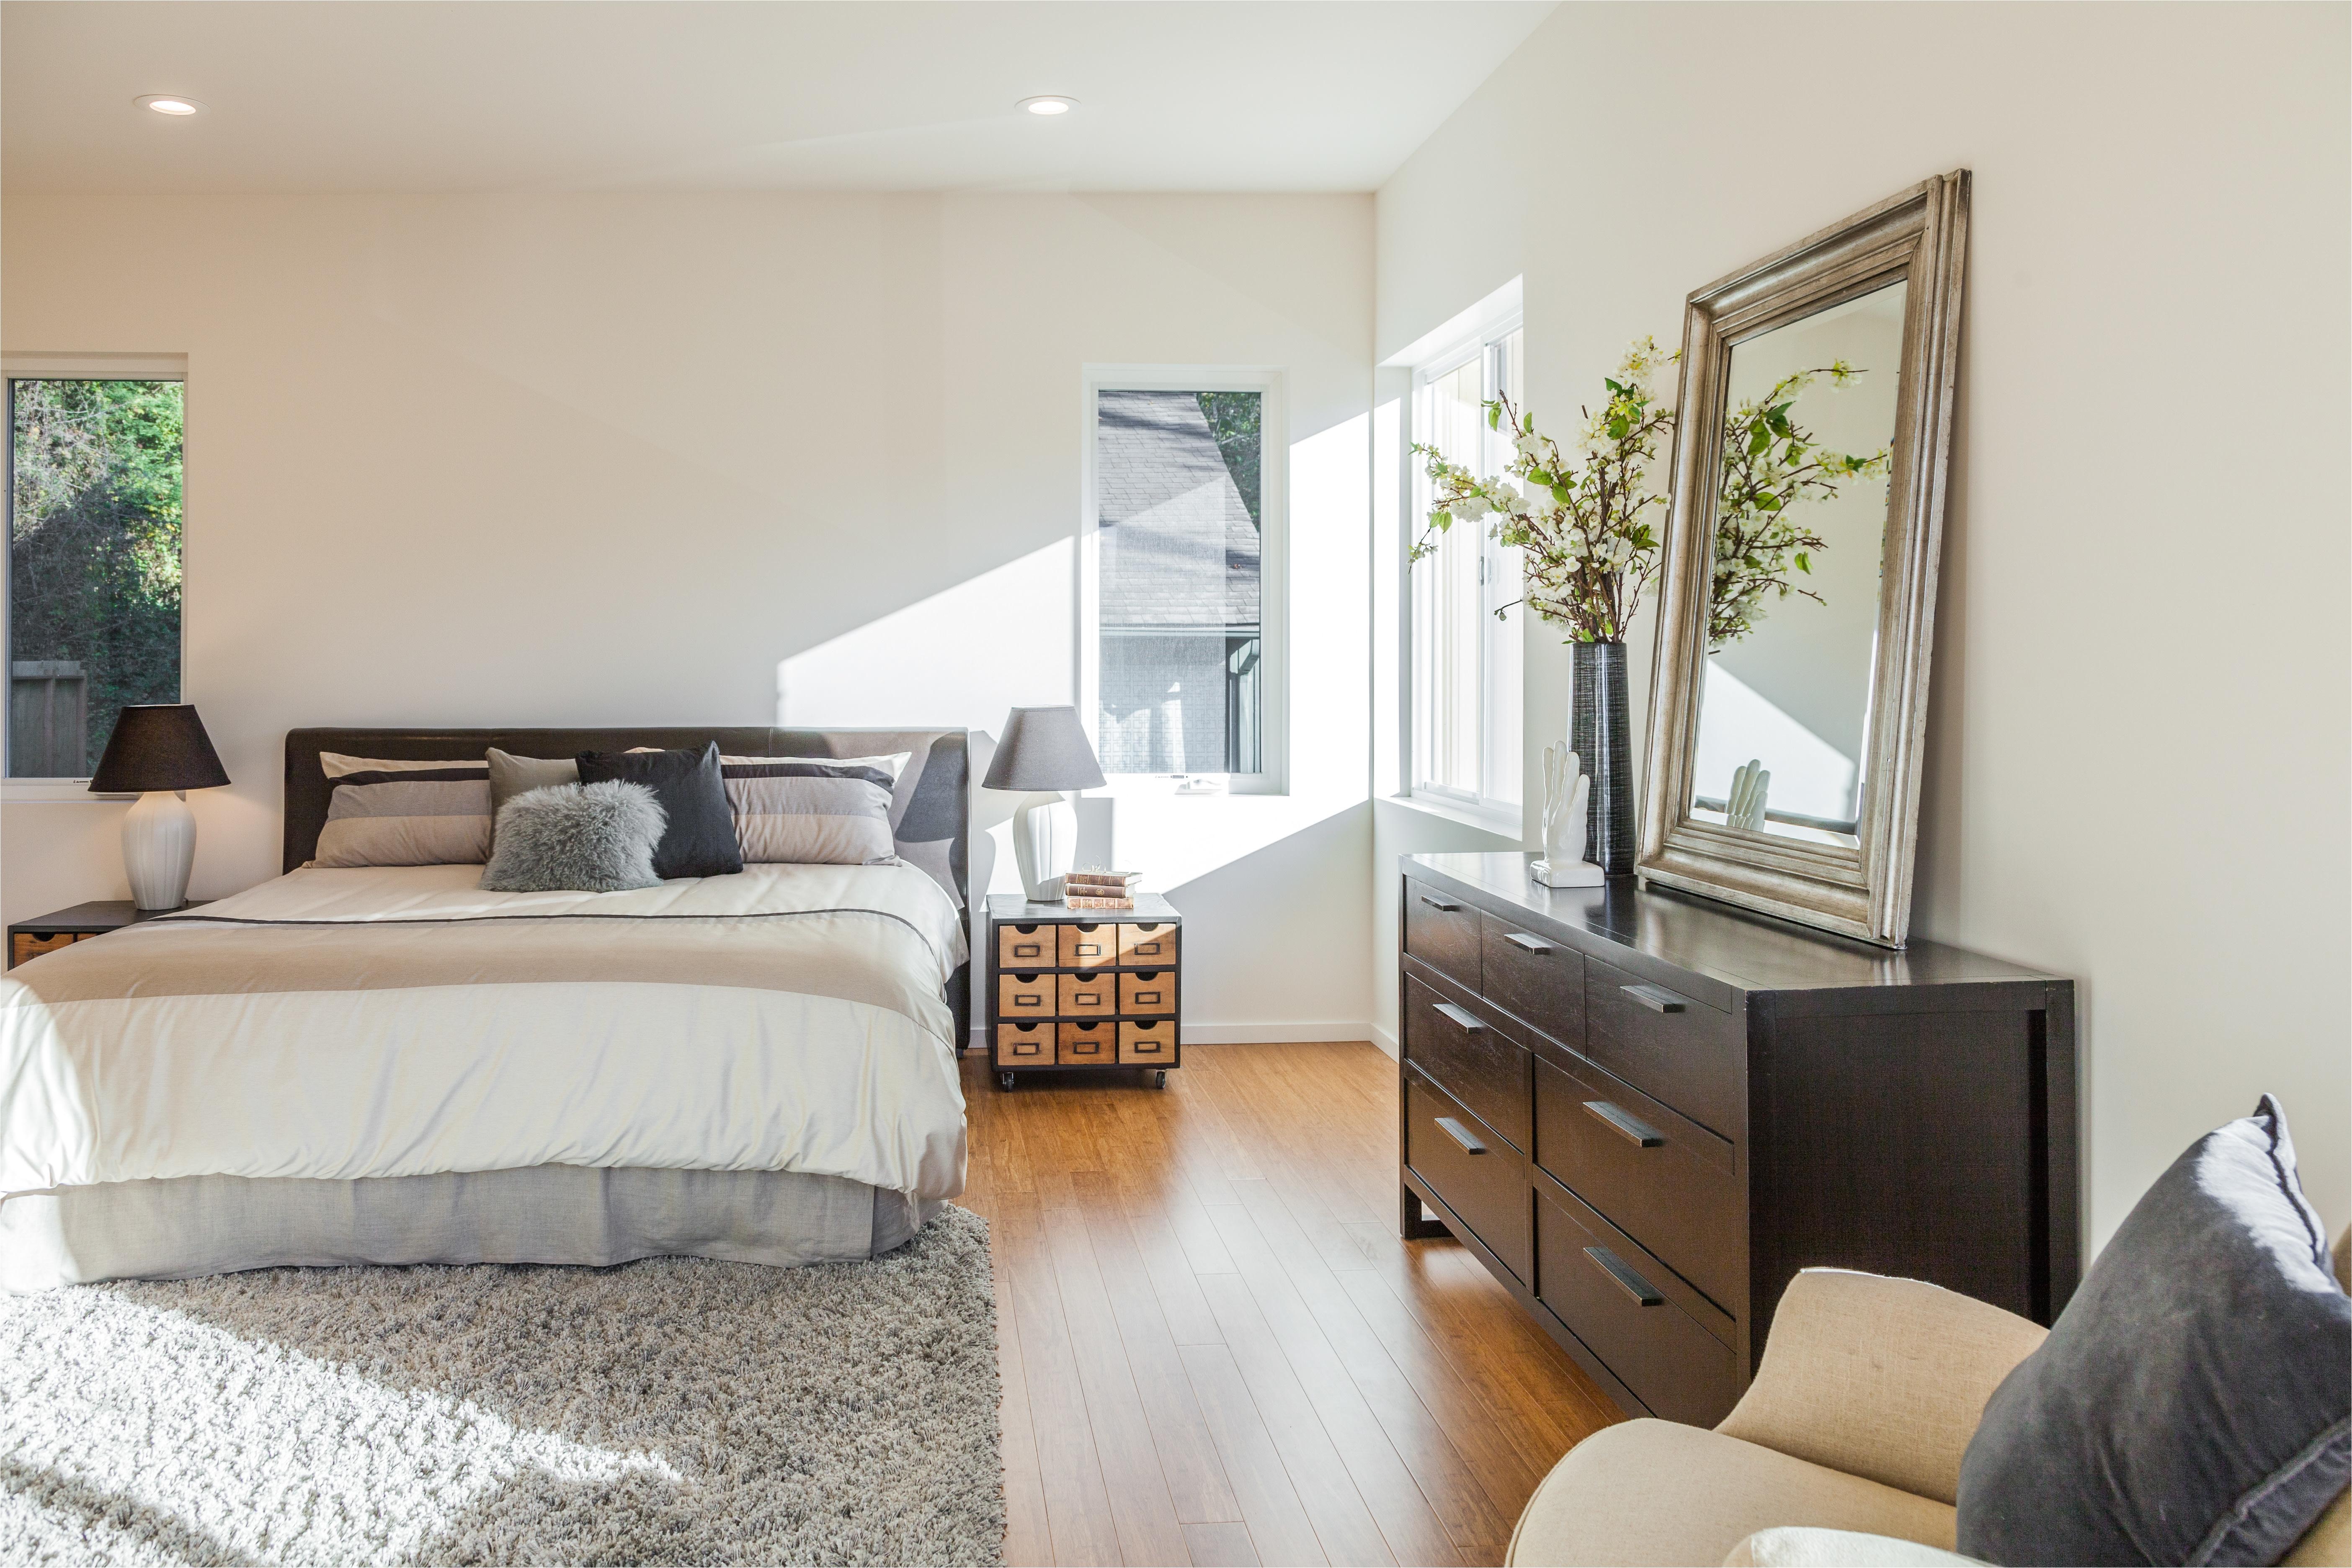 1 Bedroom Apartments Bloomington Indiana 1 Bedroom Apartments In Baltimore Bedroom Design Inspiration 2018